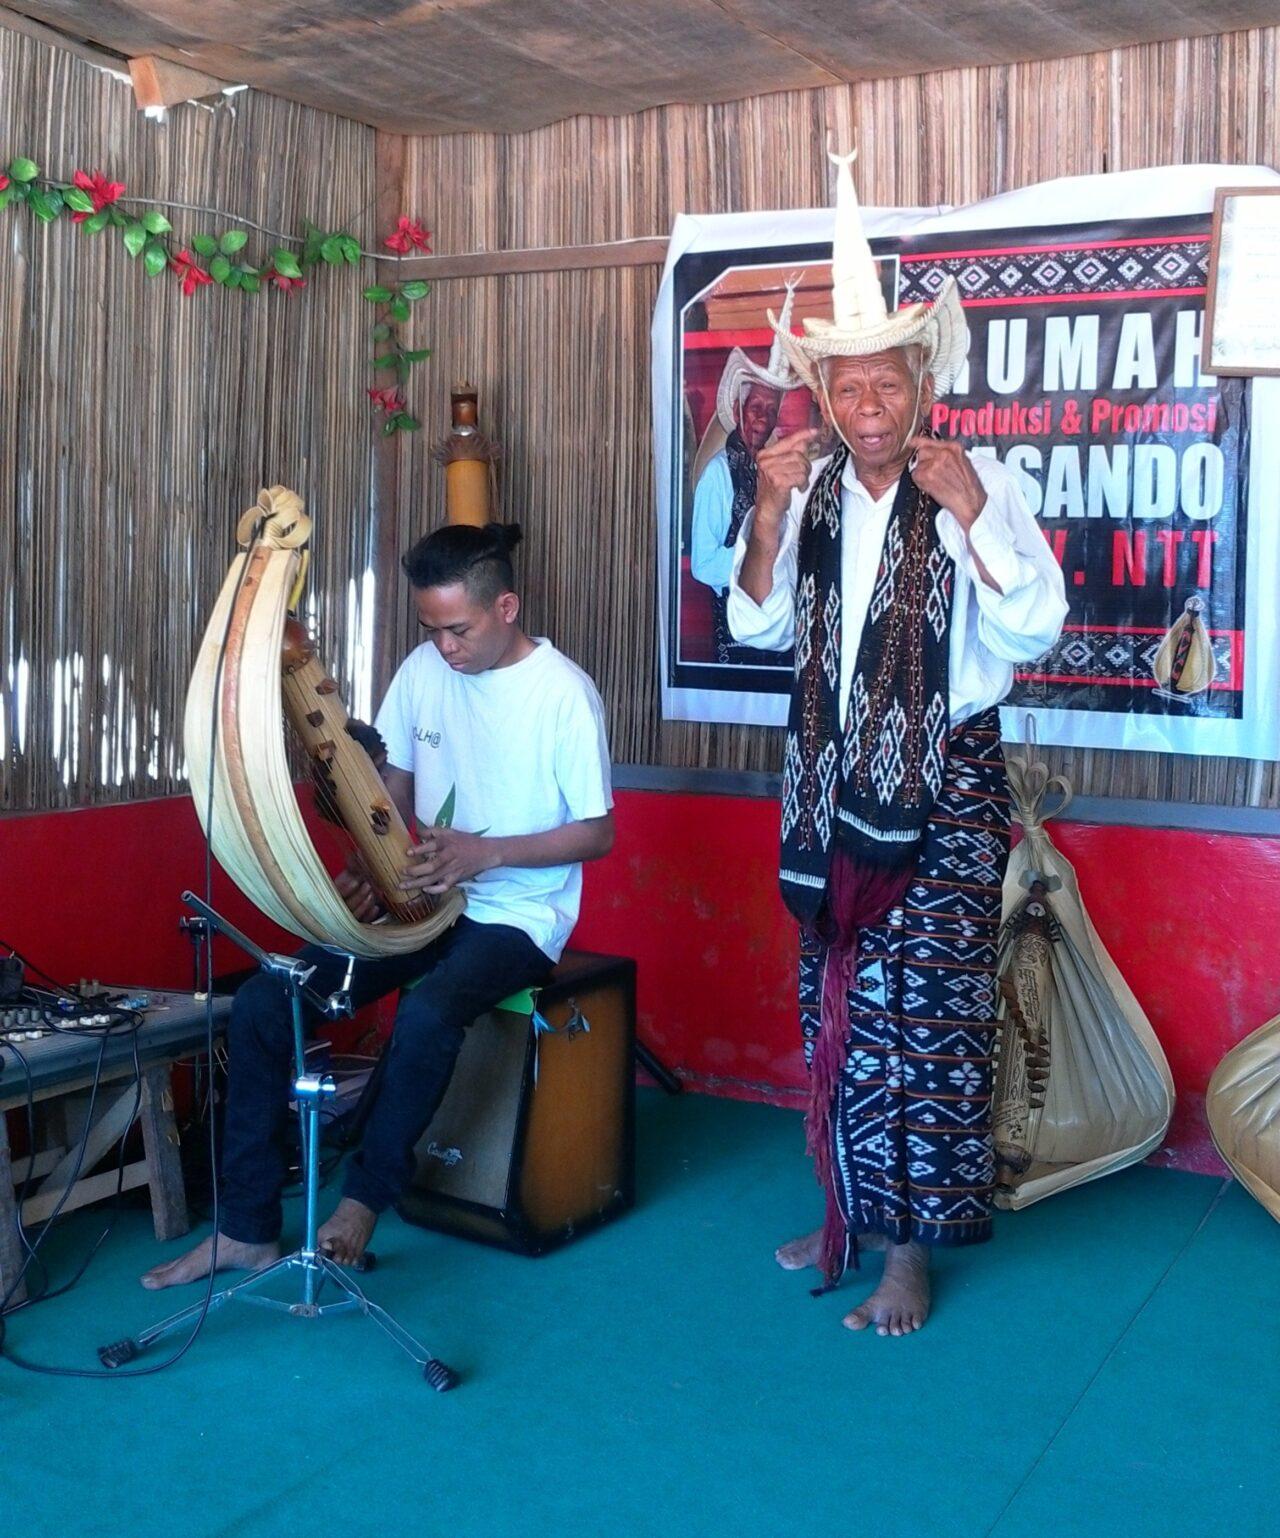 Sasando, Timor, Indonesia